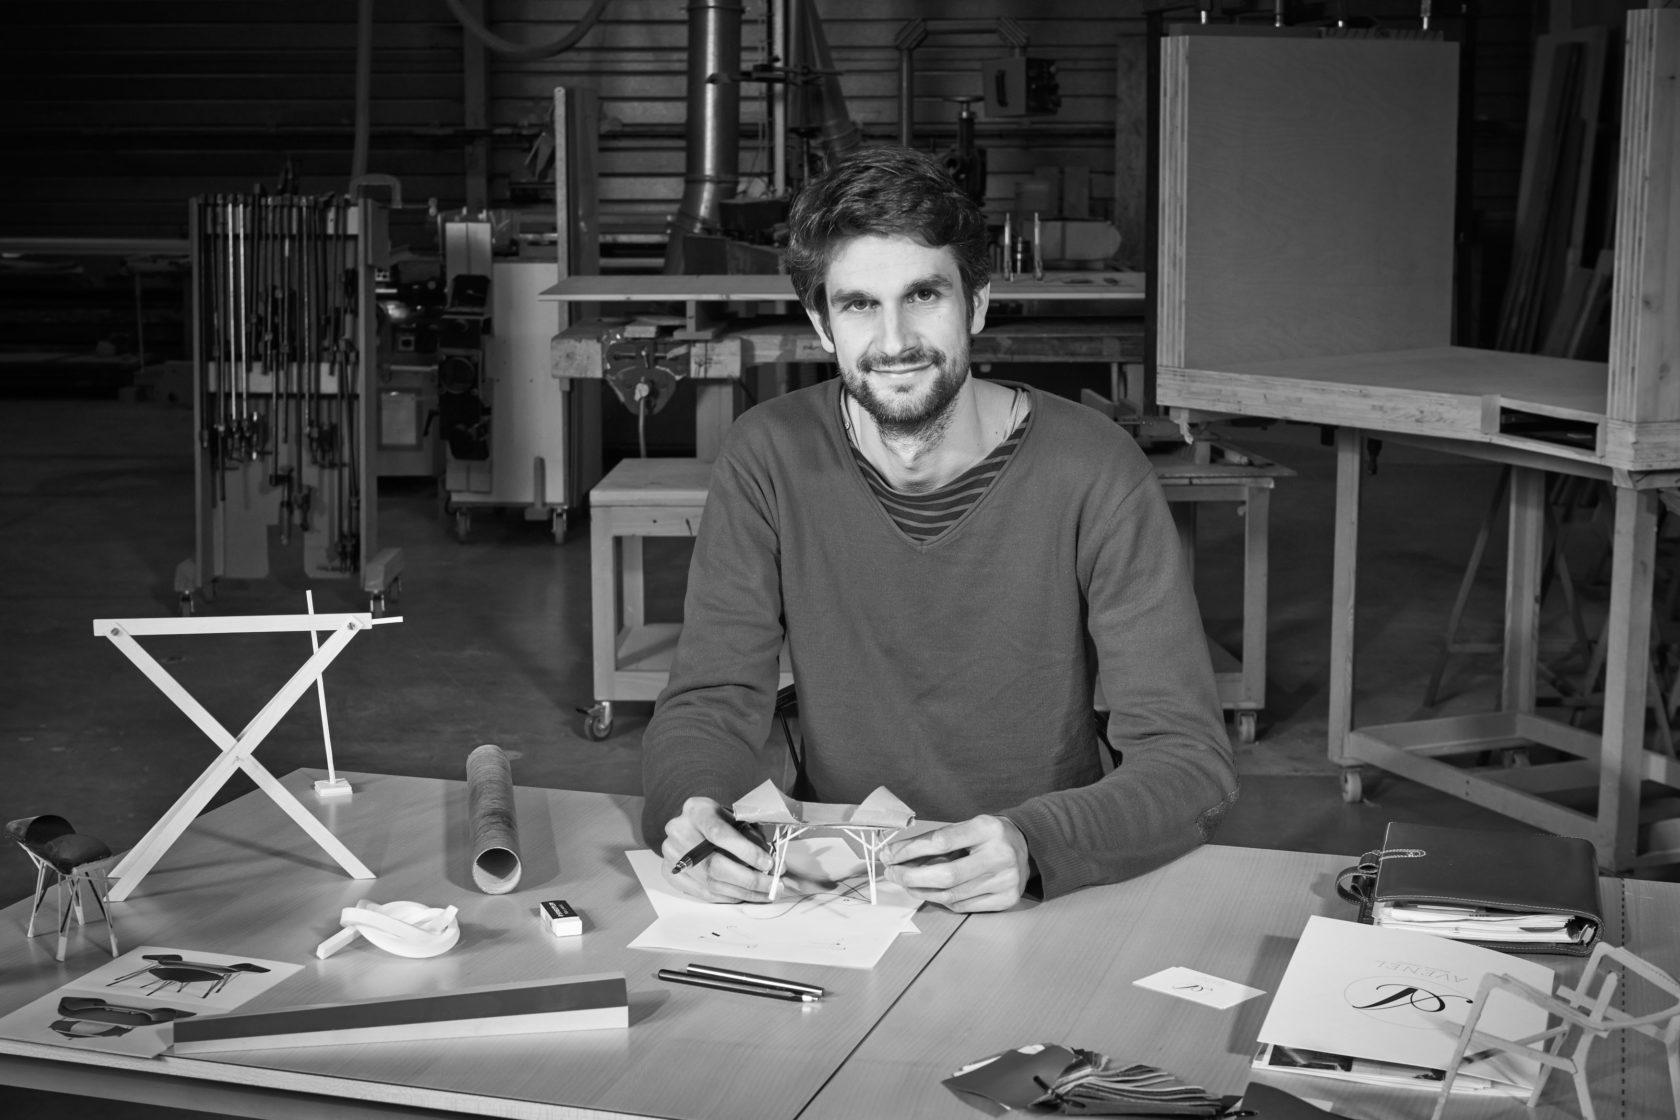 Ludovic AVENEL cabinet maker Paris - Ludovic Avenel